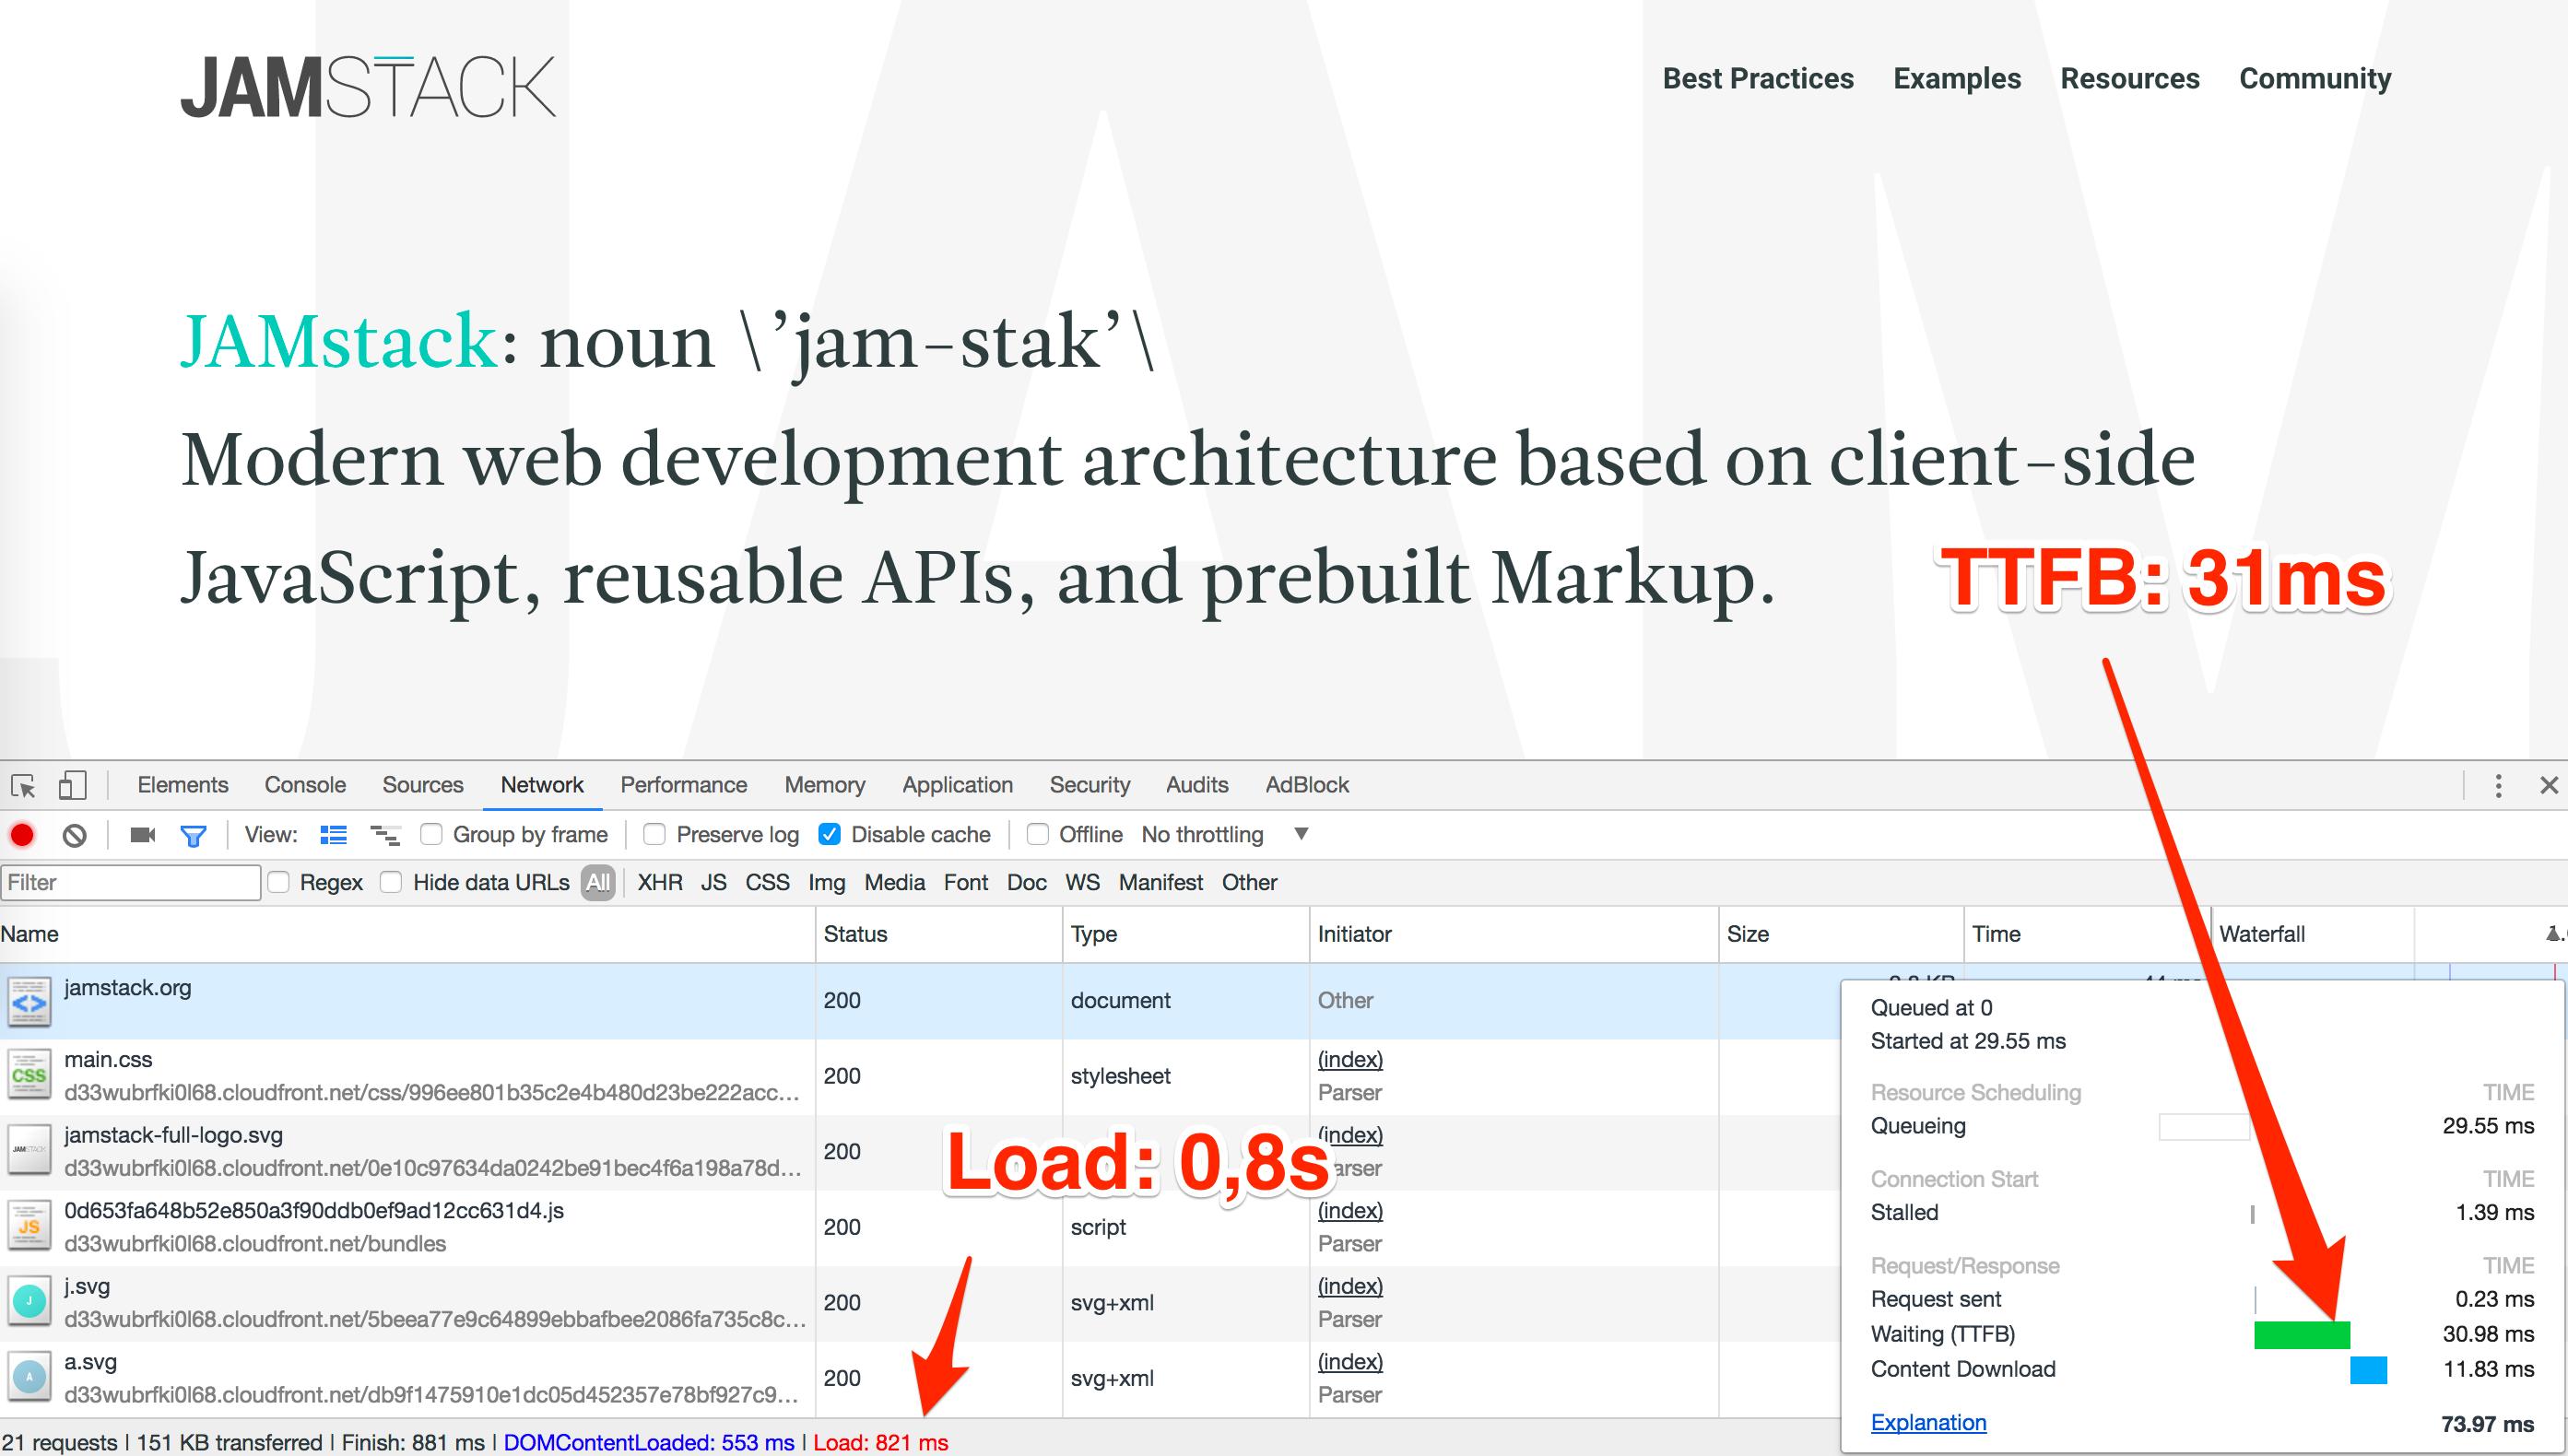 JAMstack sites load fast